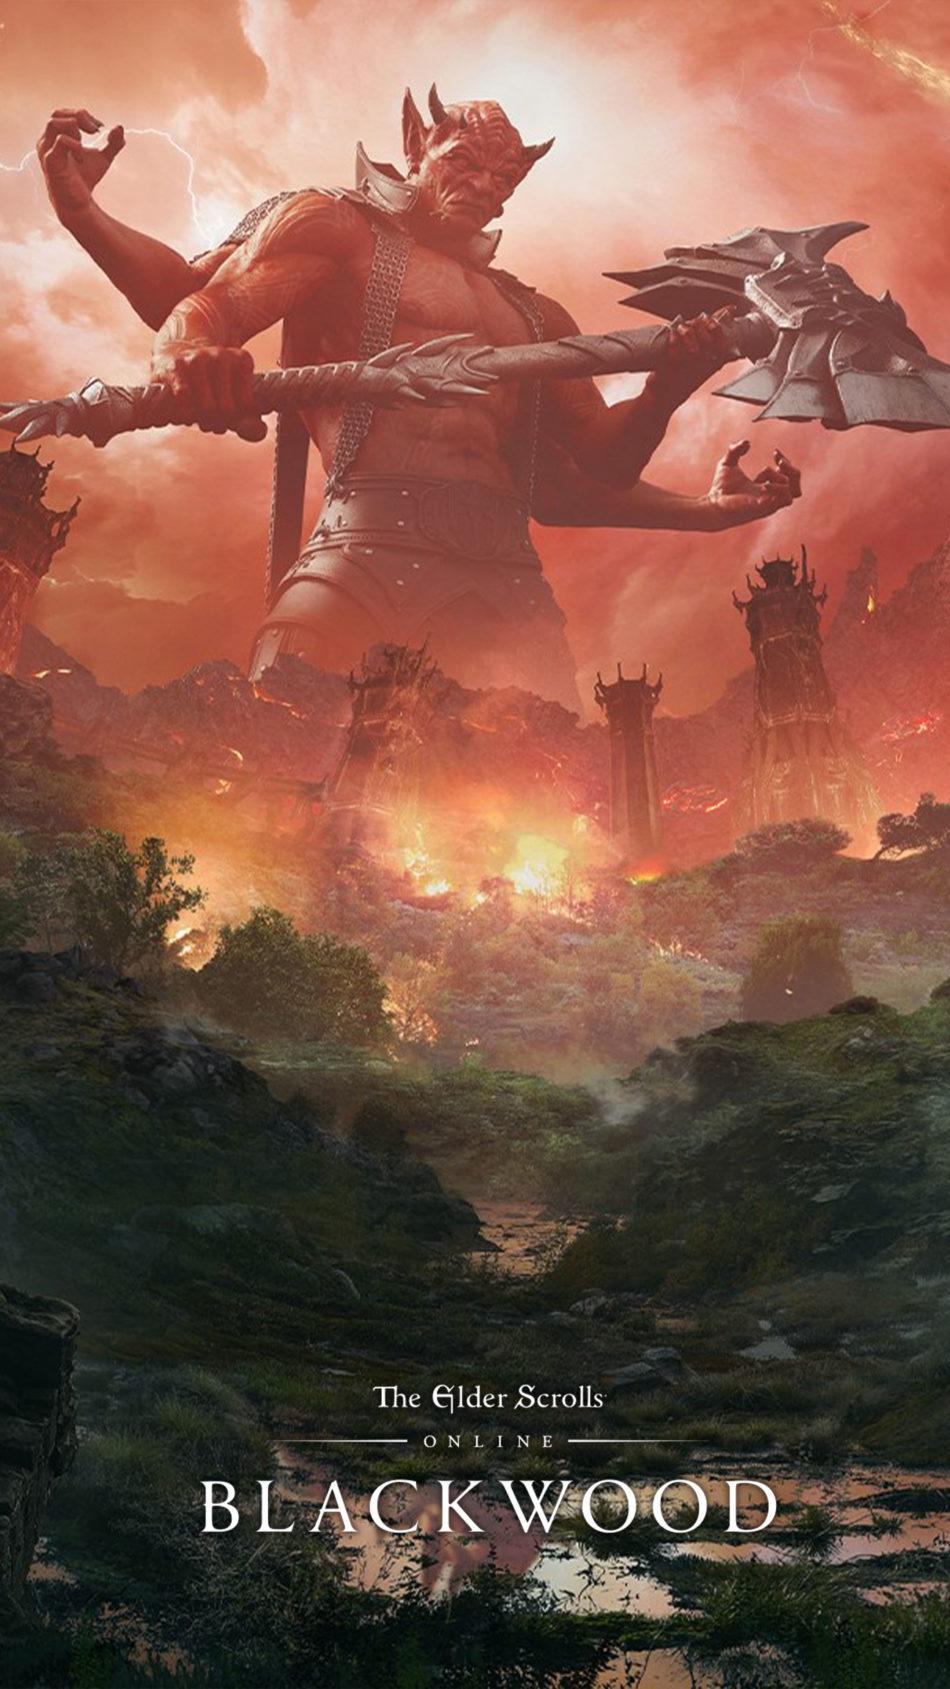 The Elder Scrolls Online - Blackwood Game Poster 4K Ultra HD Mobile Wallpaper